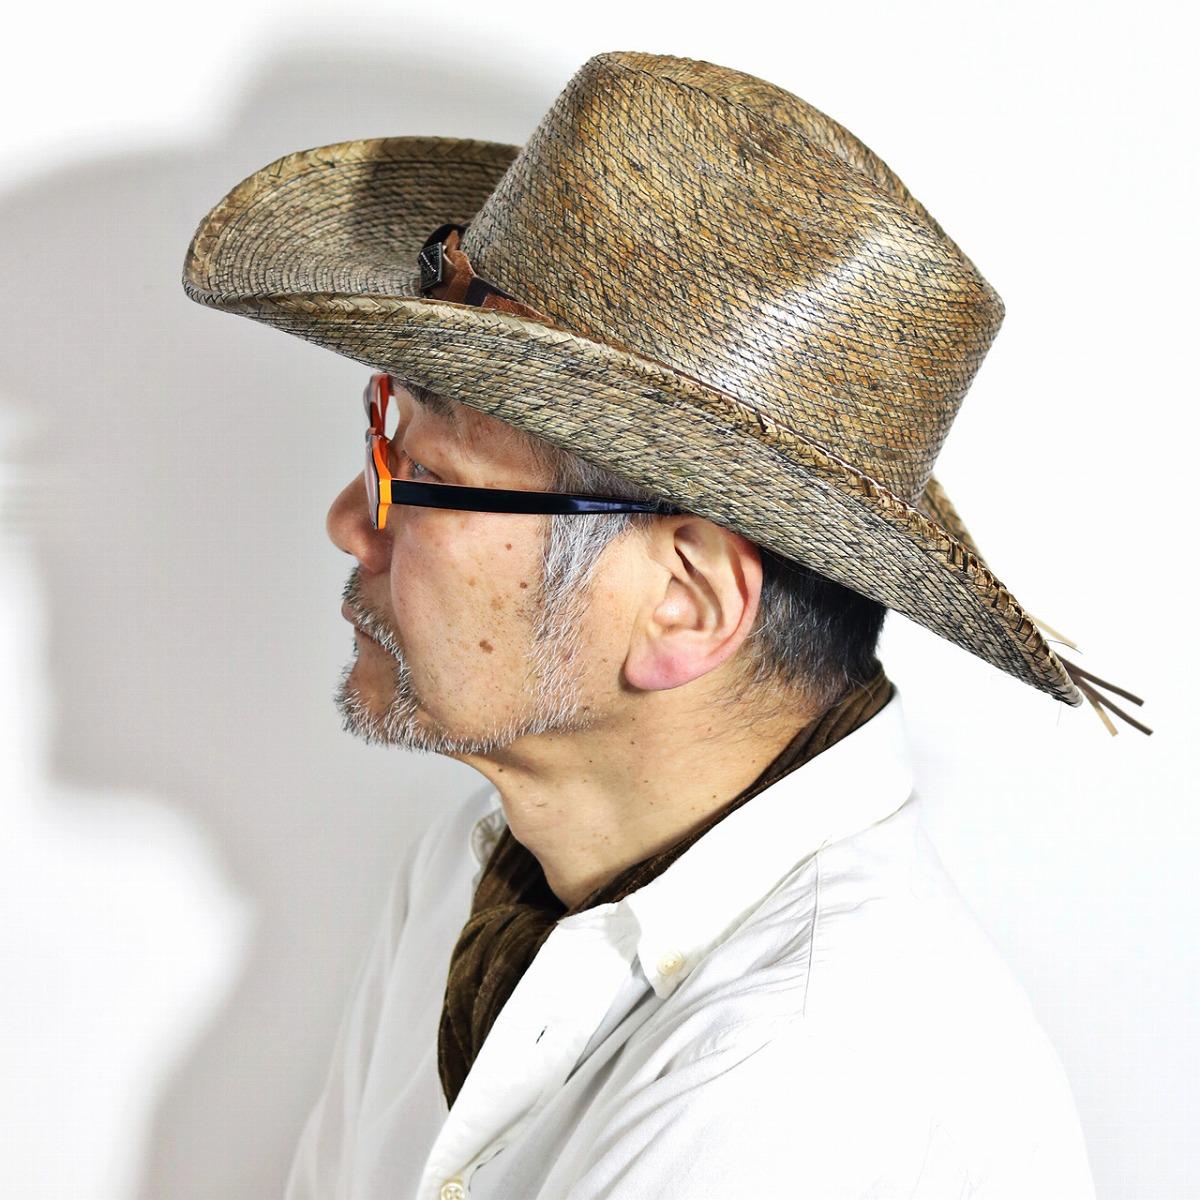 5c735cbca2be3 Mens Stetson Straw Cowboy Hats - Parchment N Lead